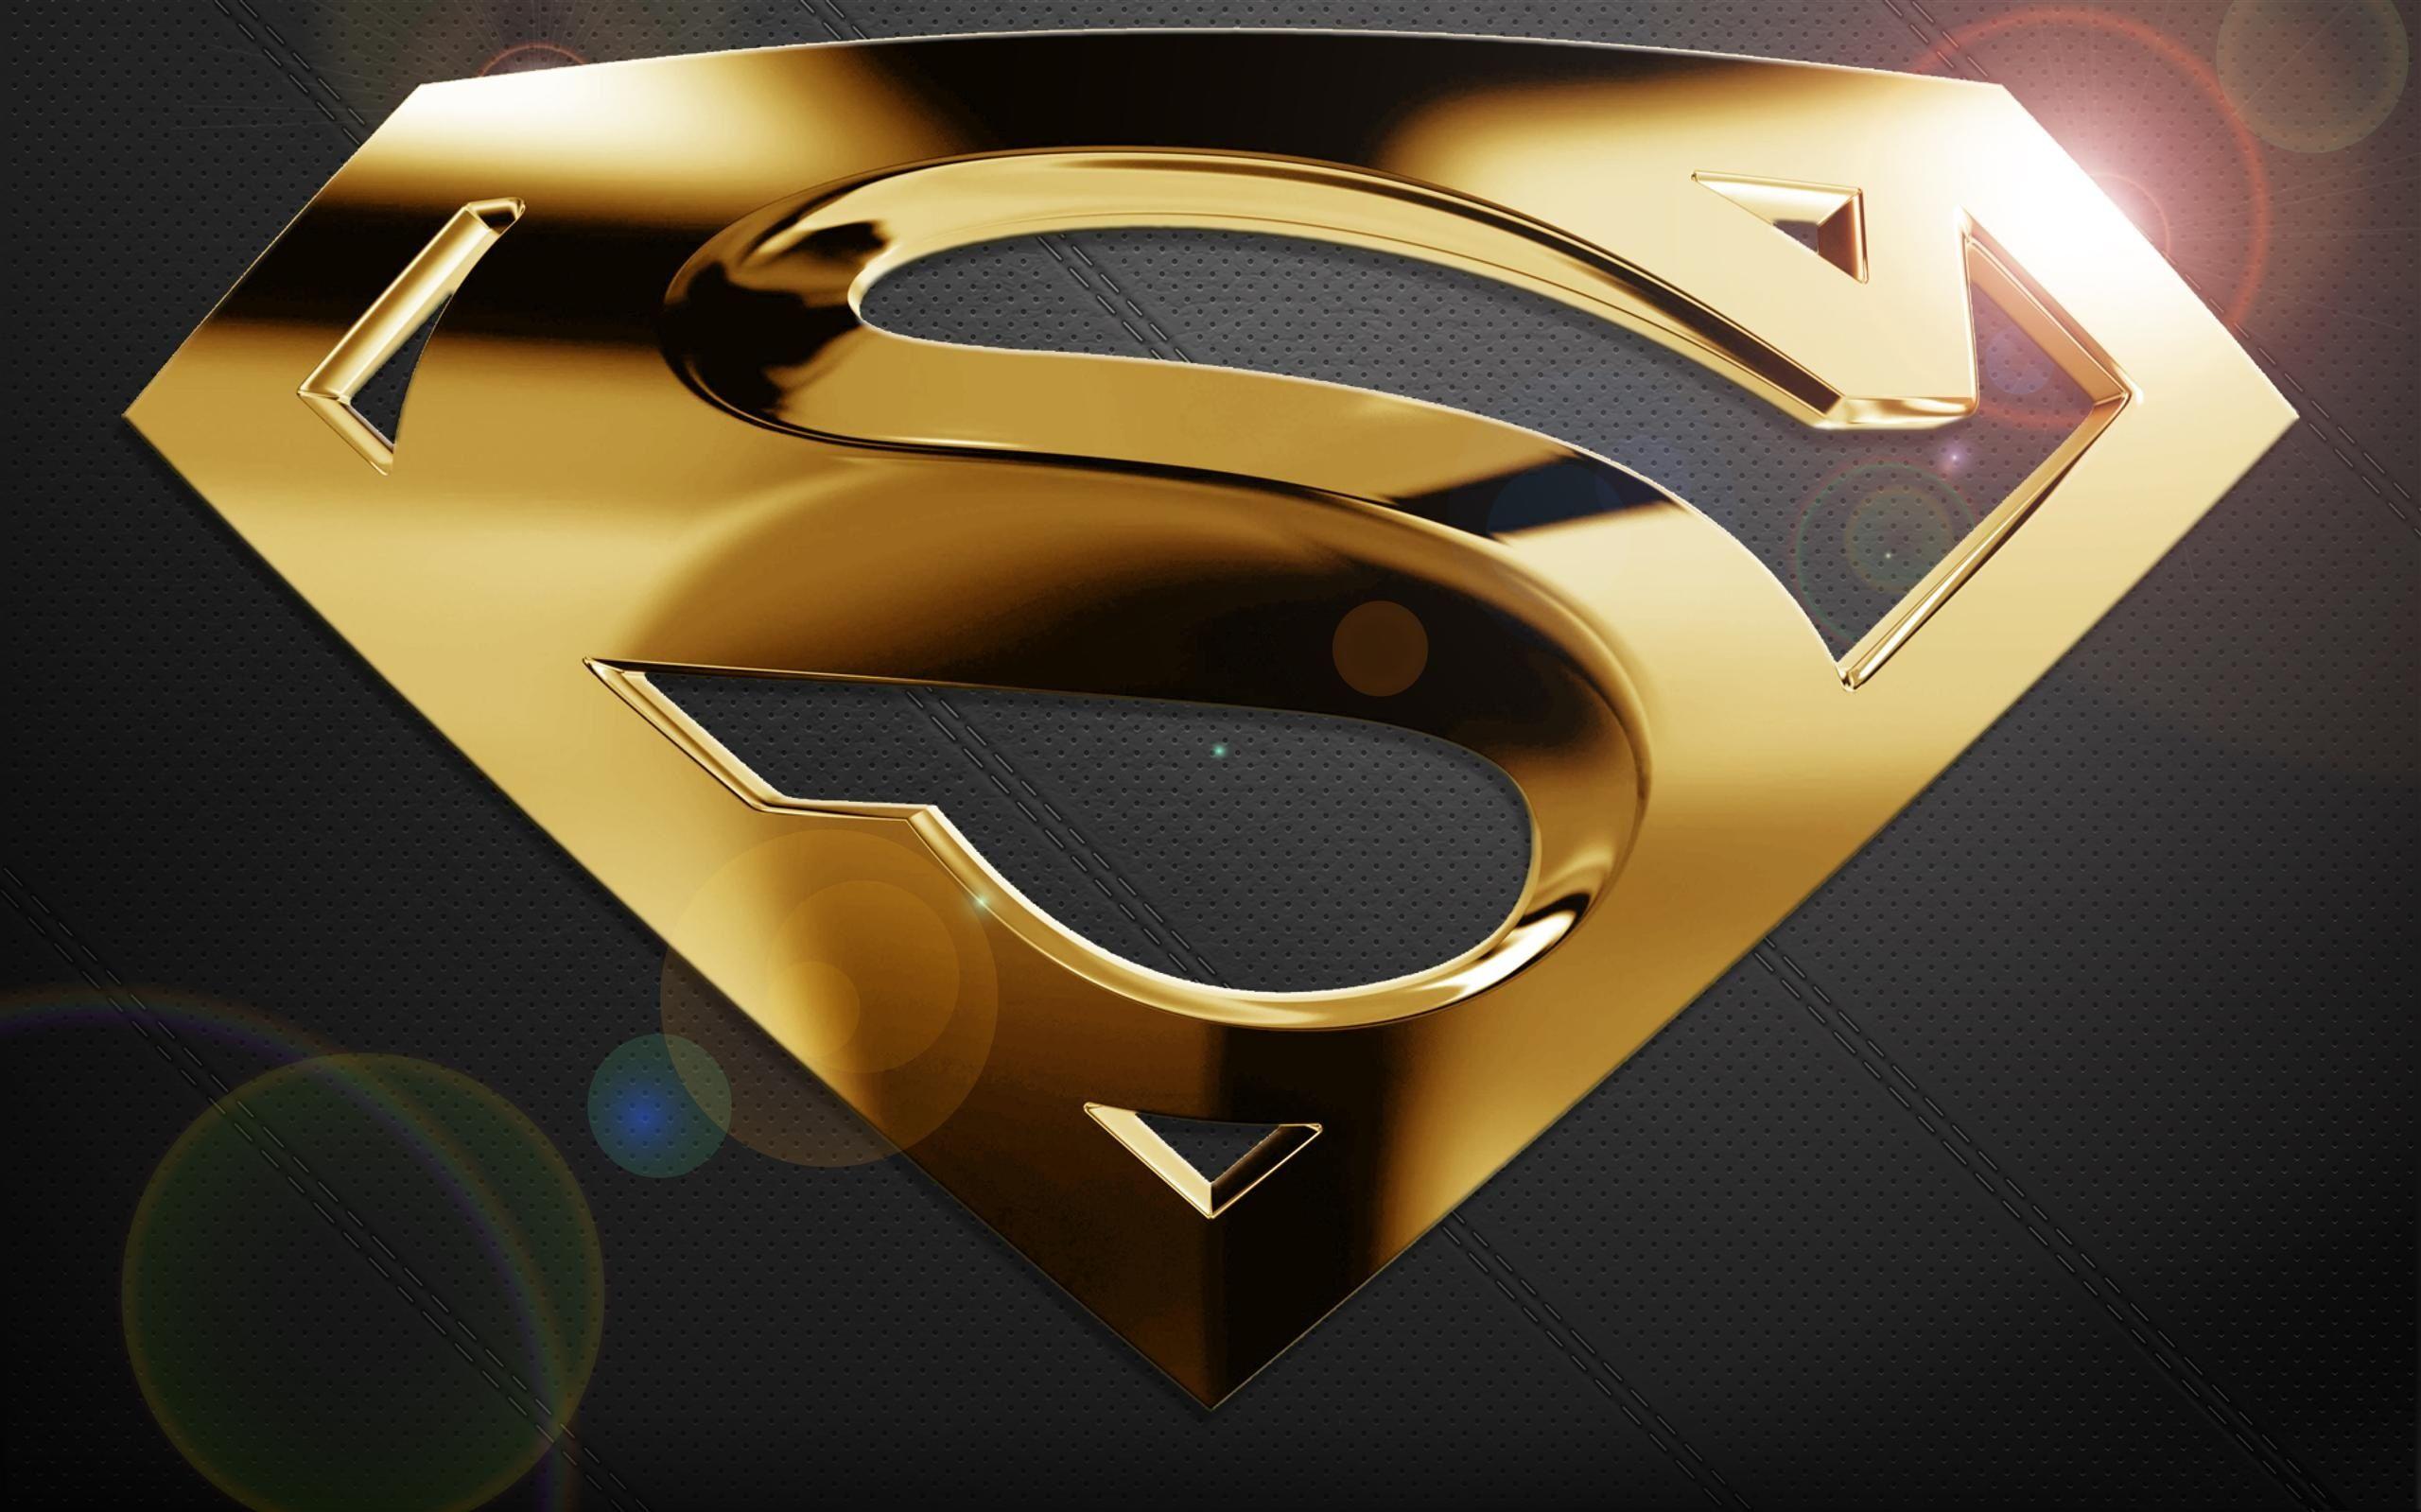 Hd wallpaper superman - Find This Pin And More On Comics New Art Funny Wallpapers Jokes Superman Logo Desktop Hd